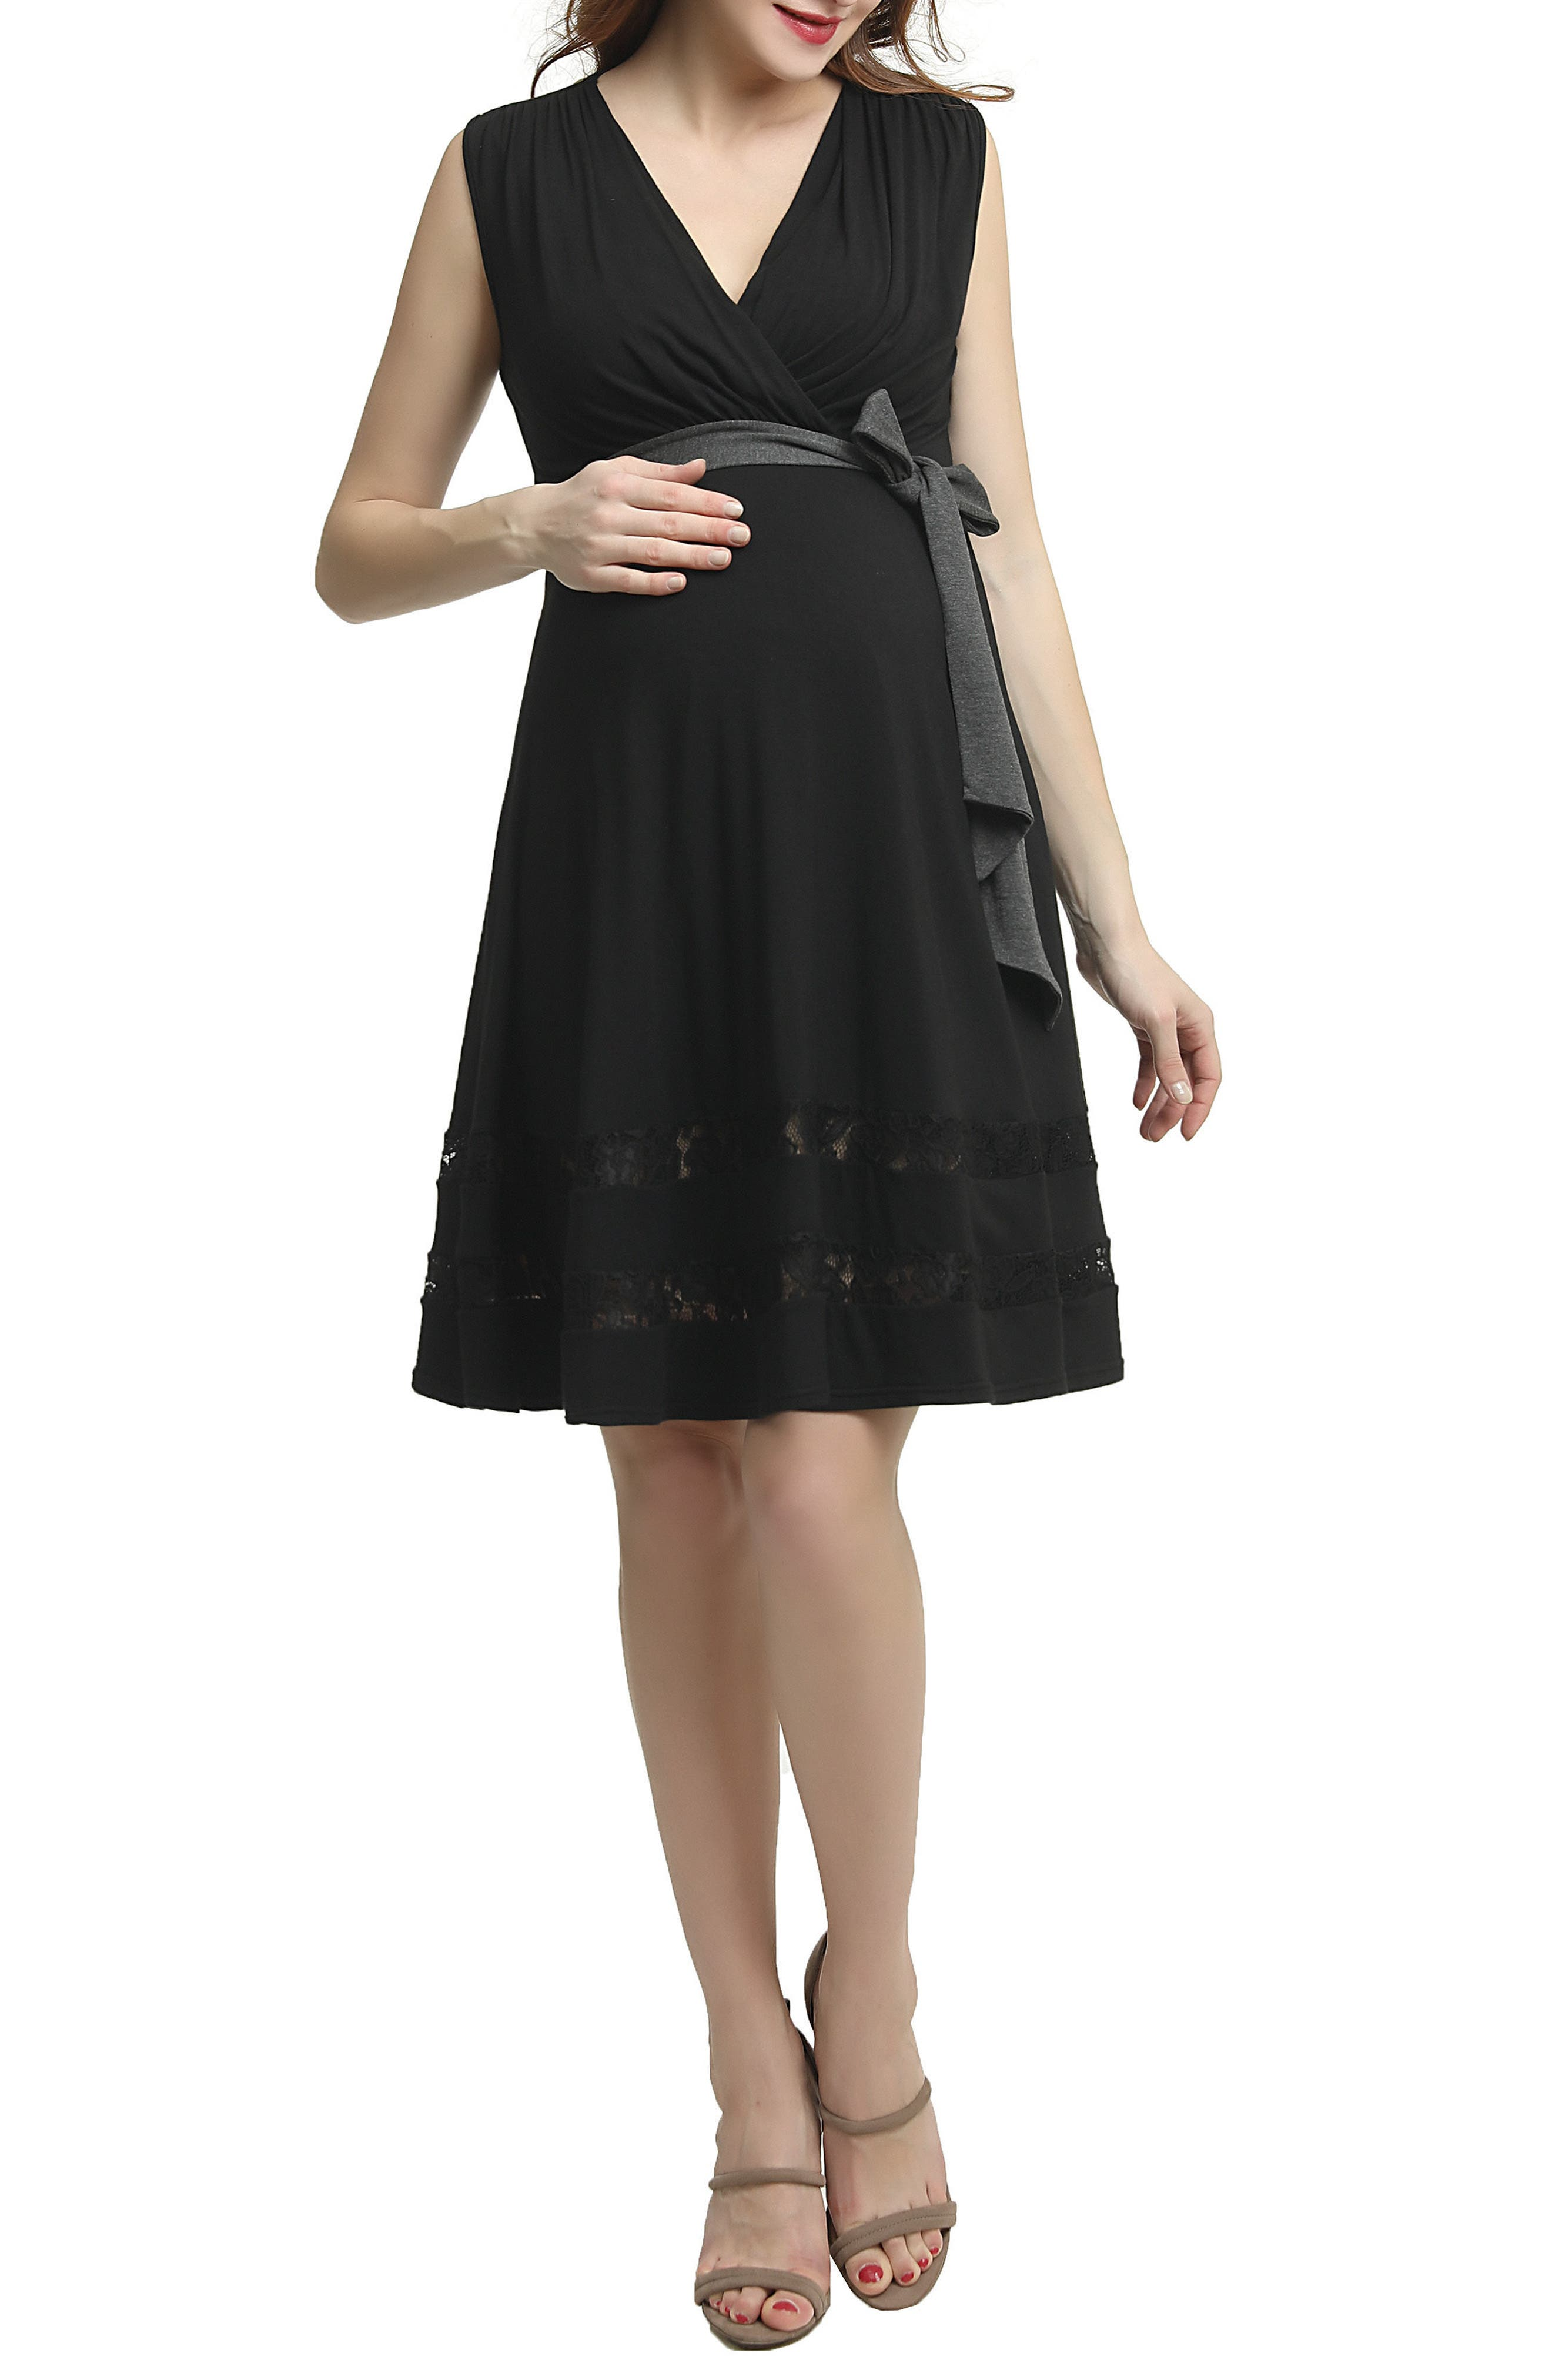 Marji Lace Accent Babydoll Maternity/nursing Dress